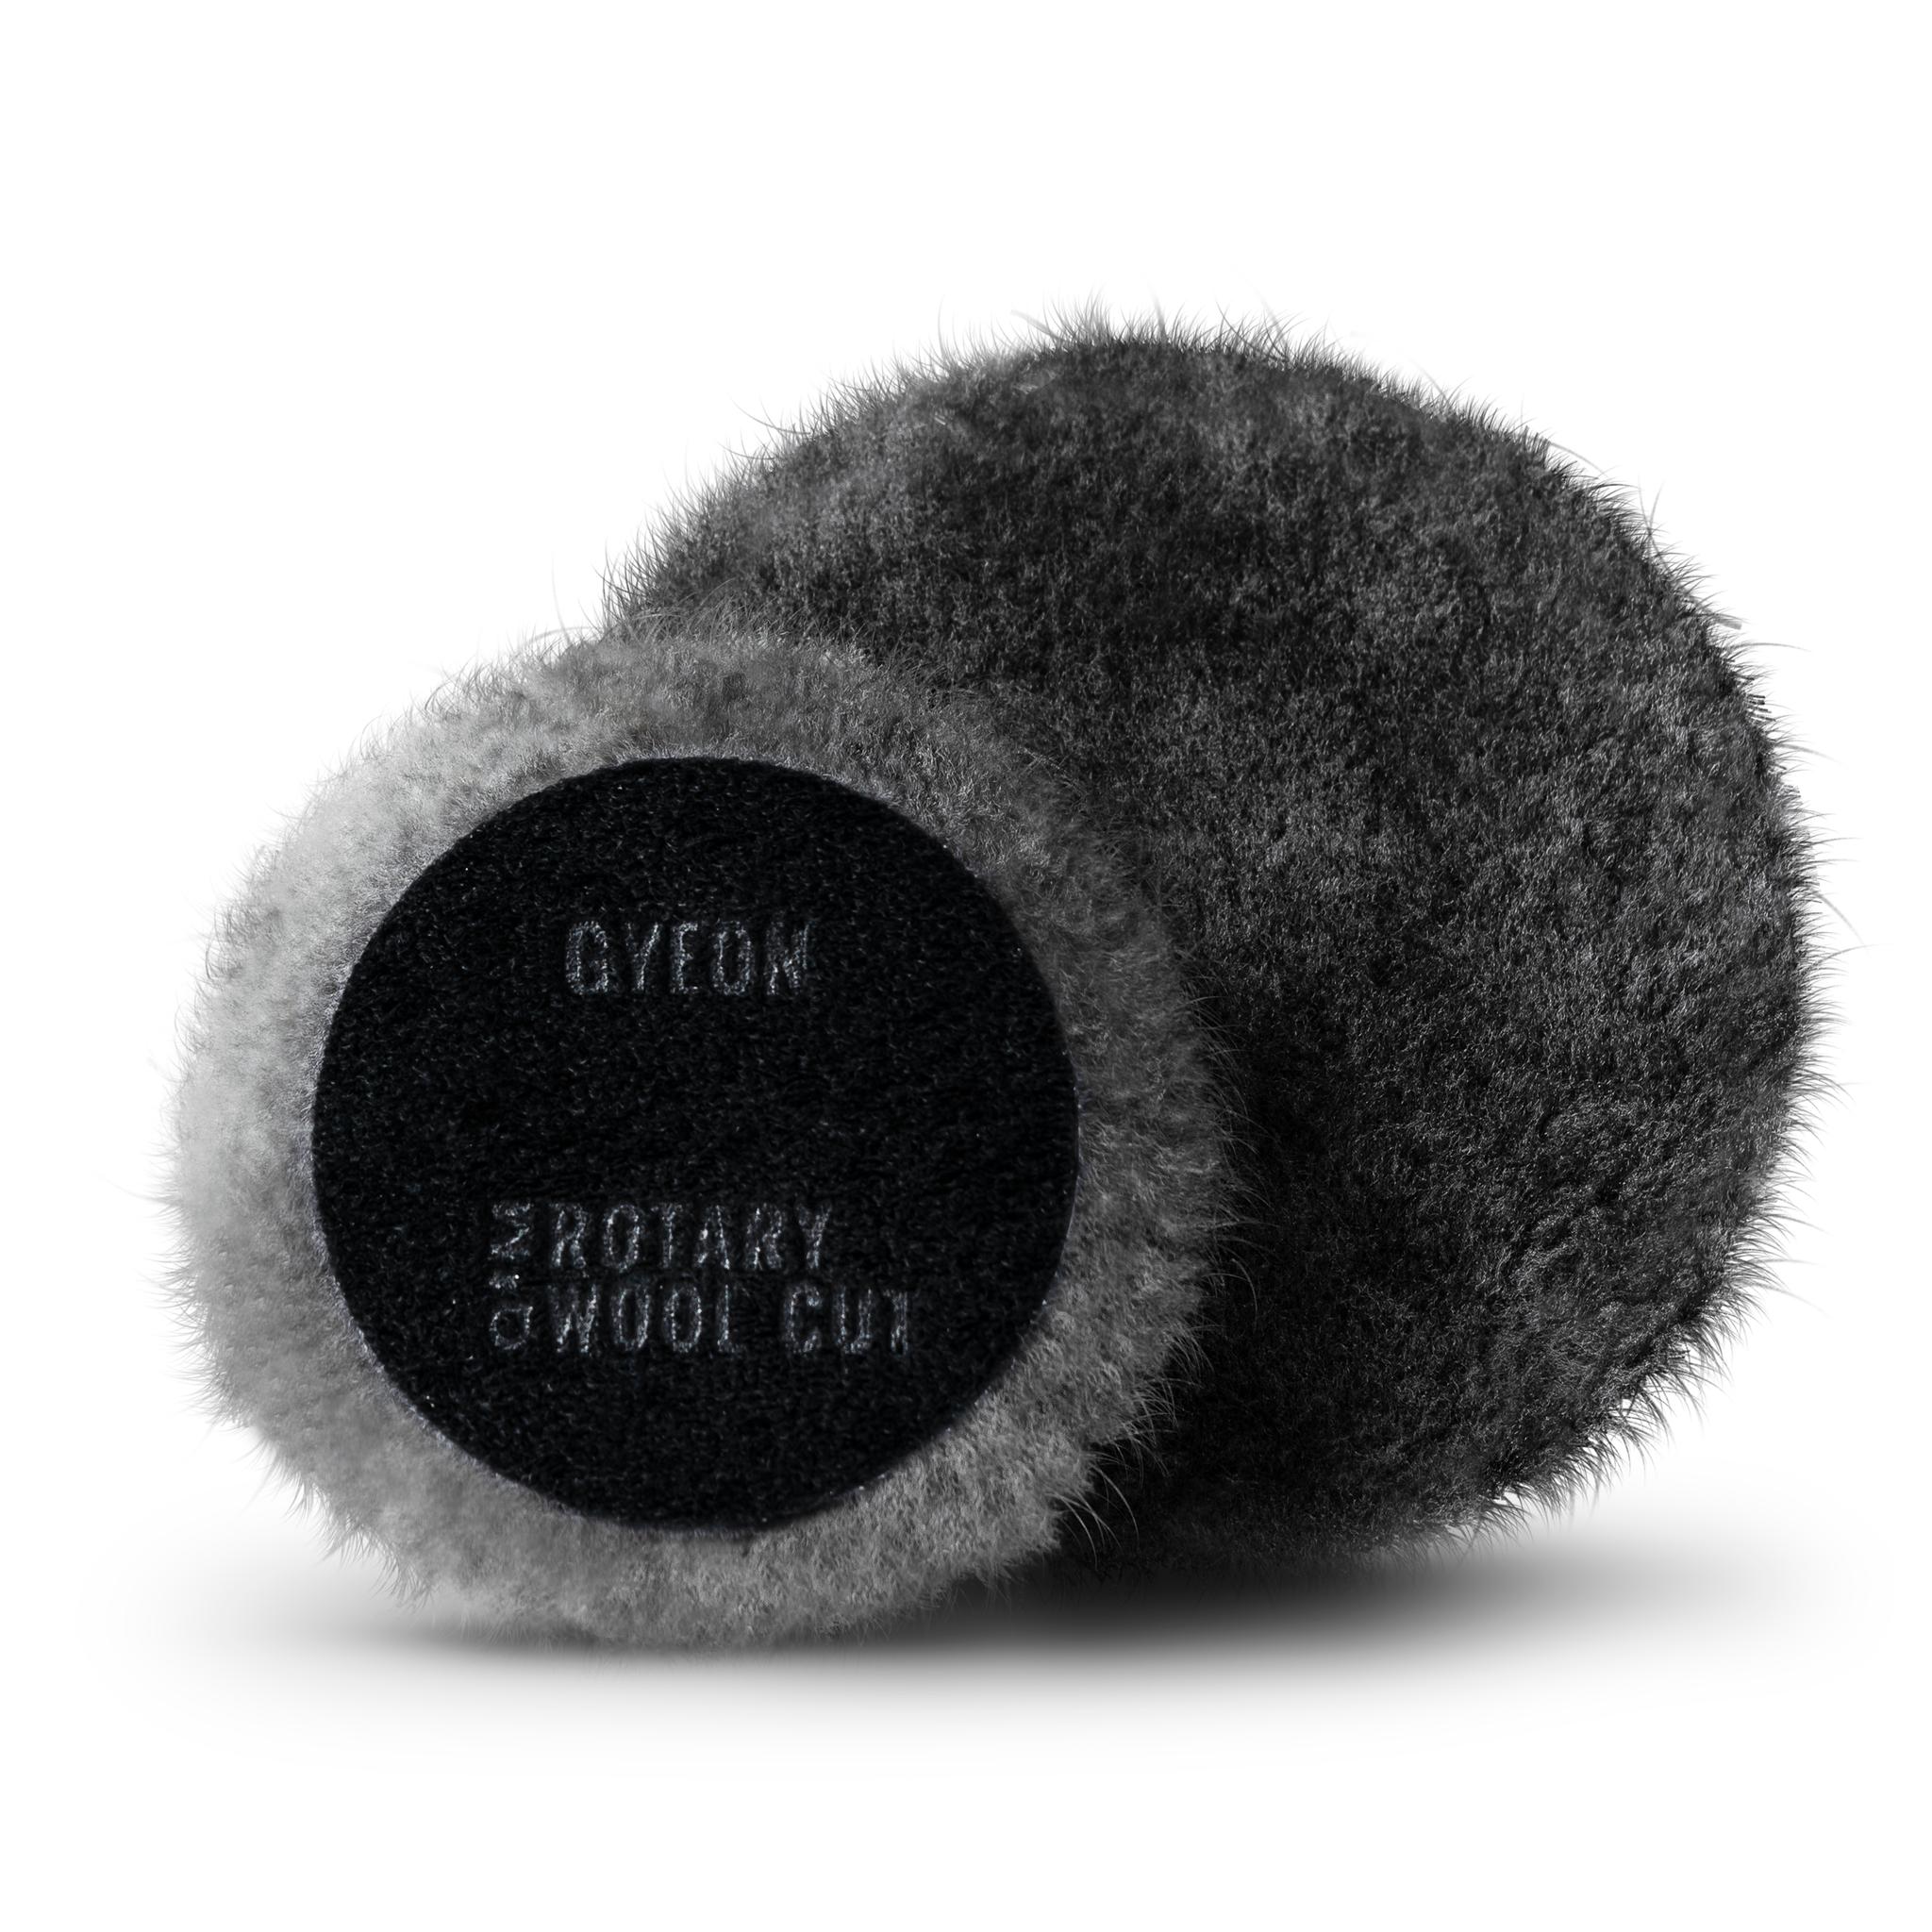 Gyeon Gyeon Q2M Rotary Wool Cut grau